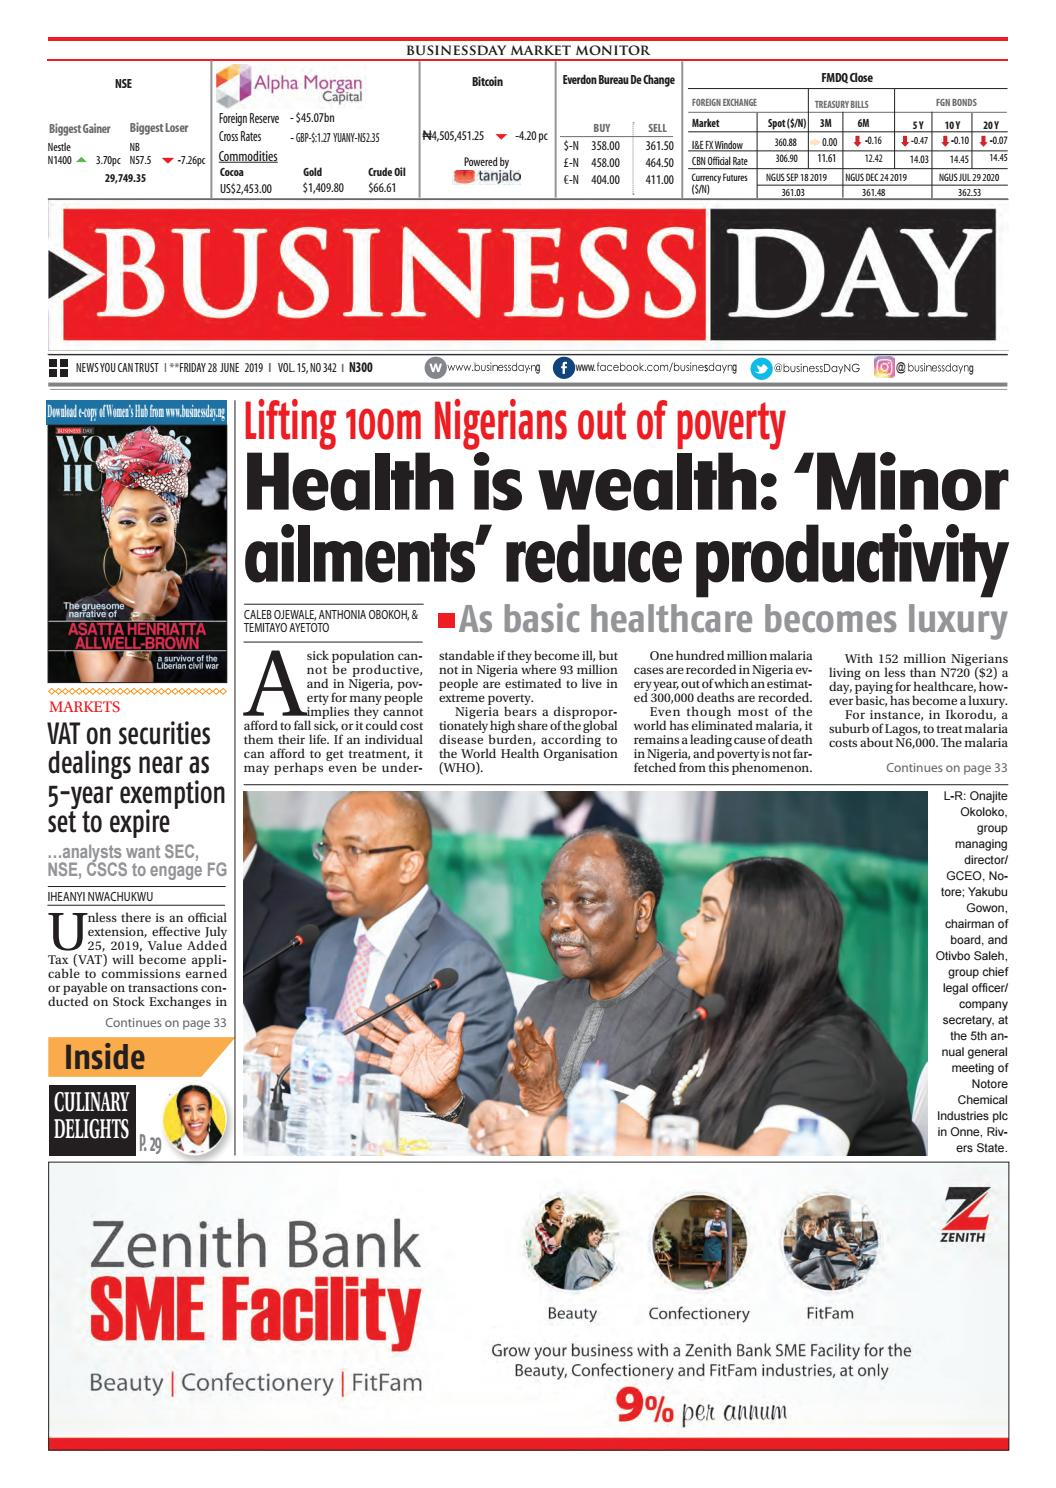 BusinessDay 28 Jun 2019 by BusinessDay - issuu